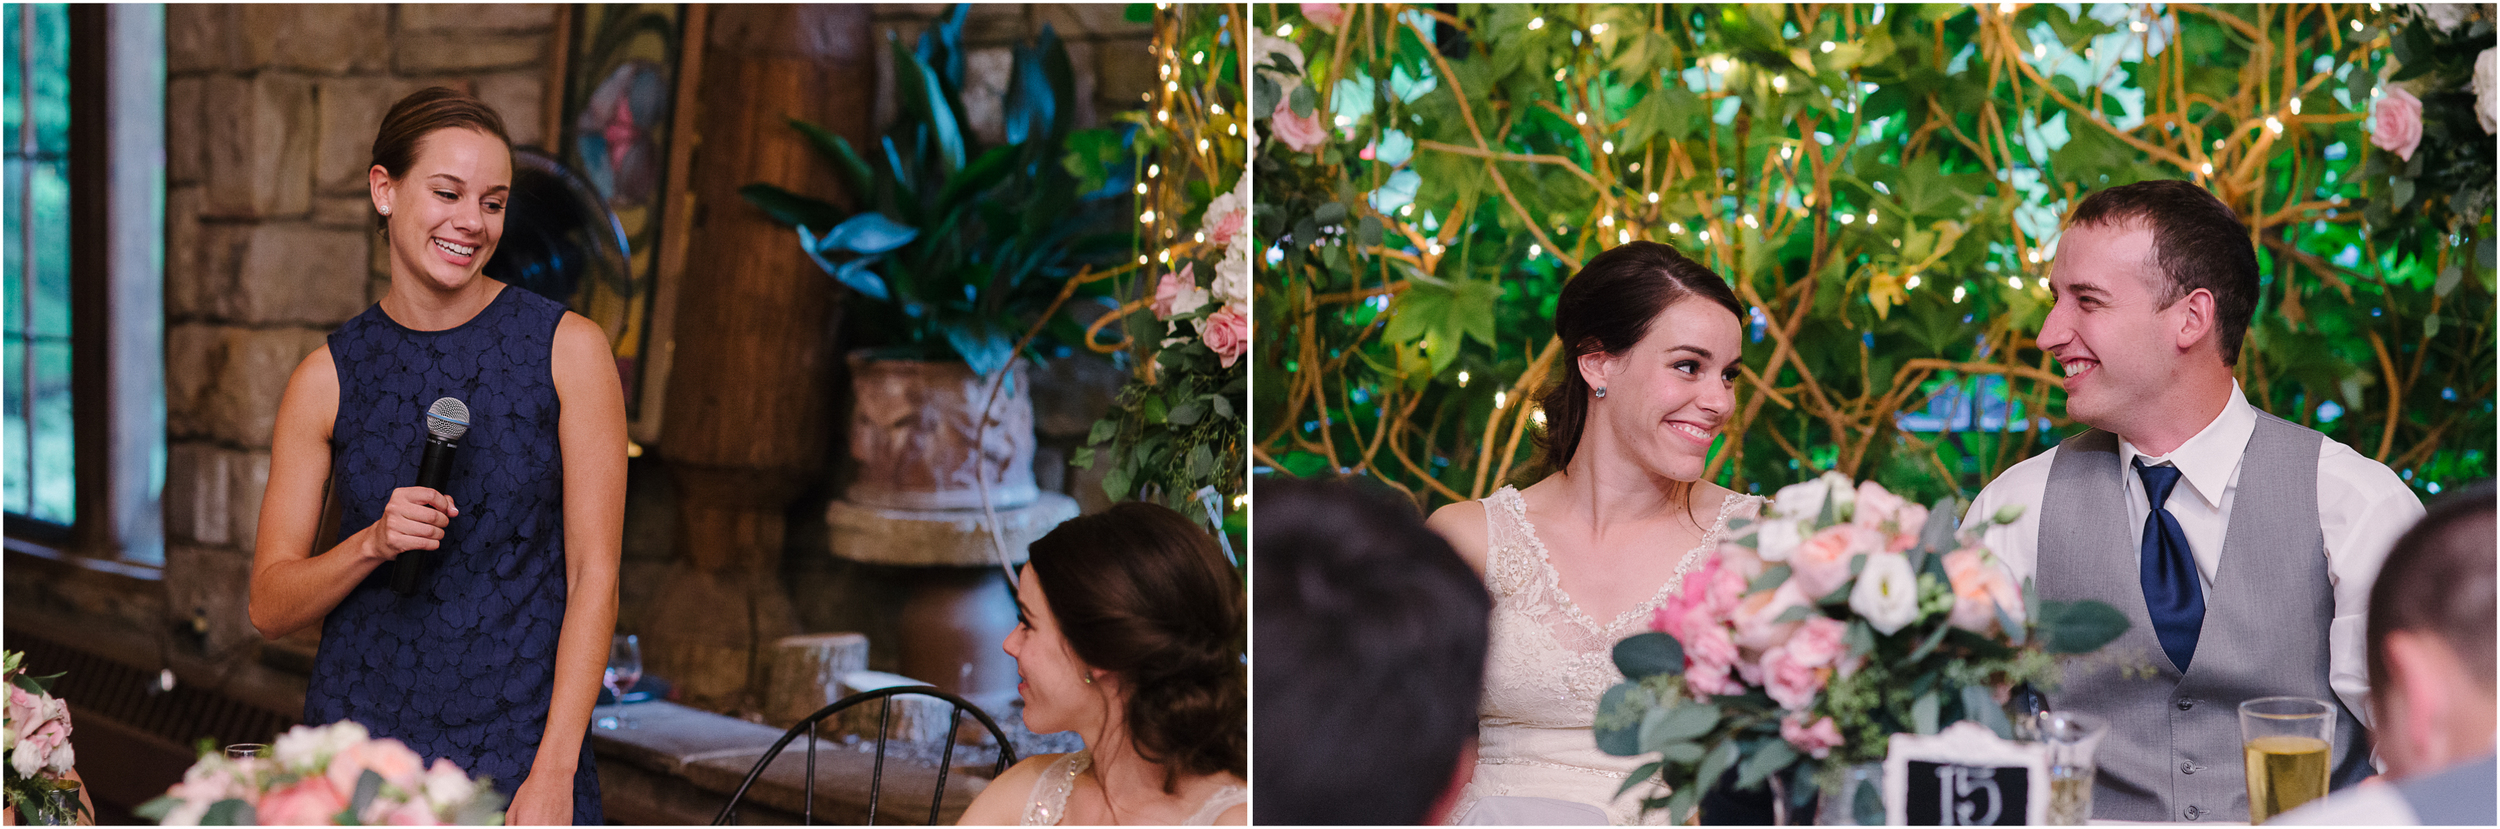 green gables wedding speeches.jpg